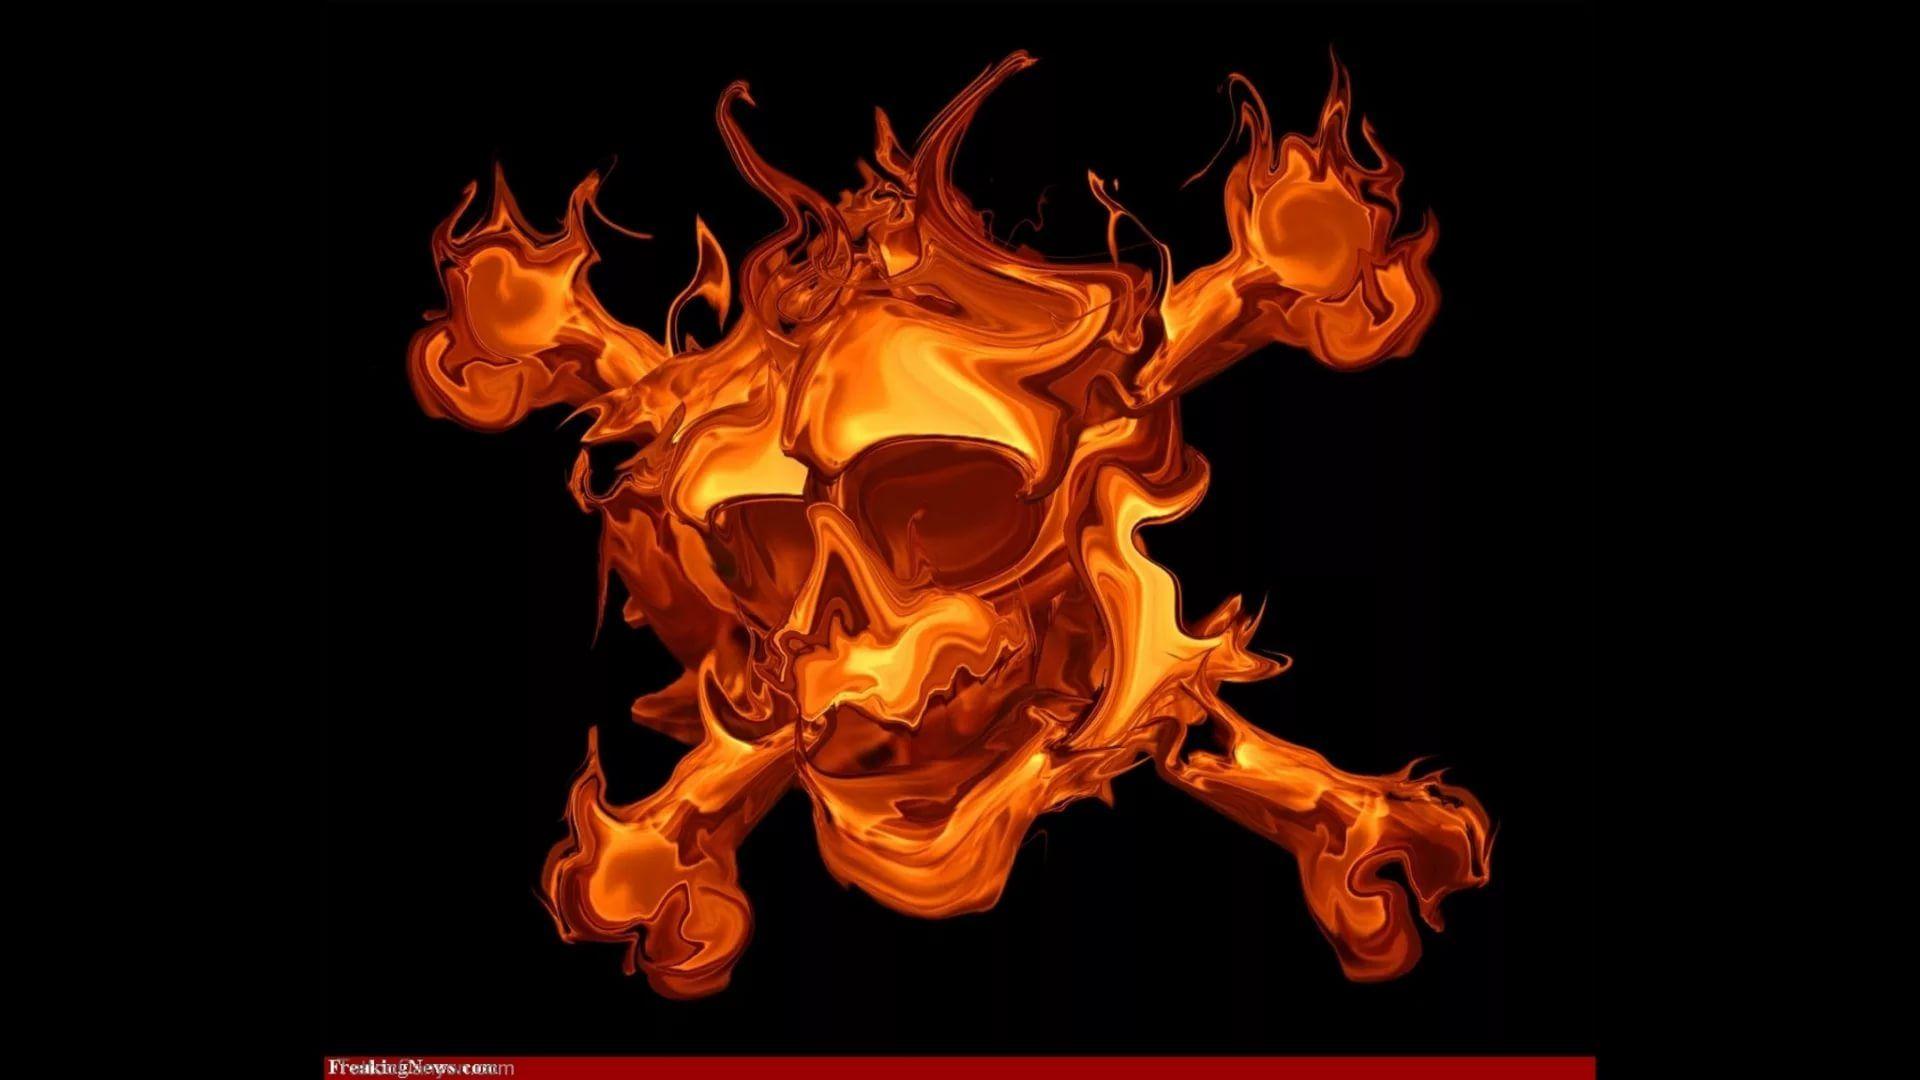 Flaming Skull wallpaper download